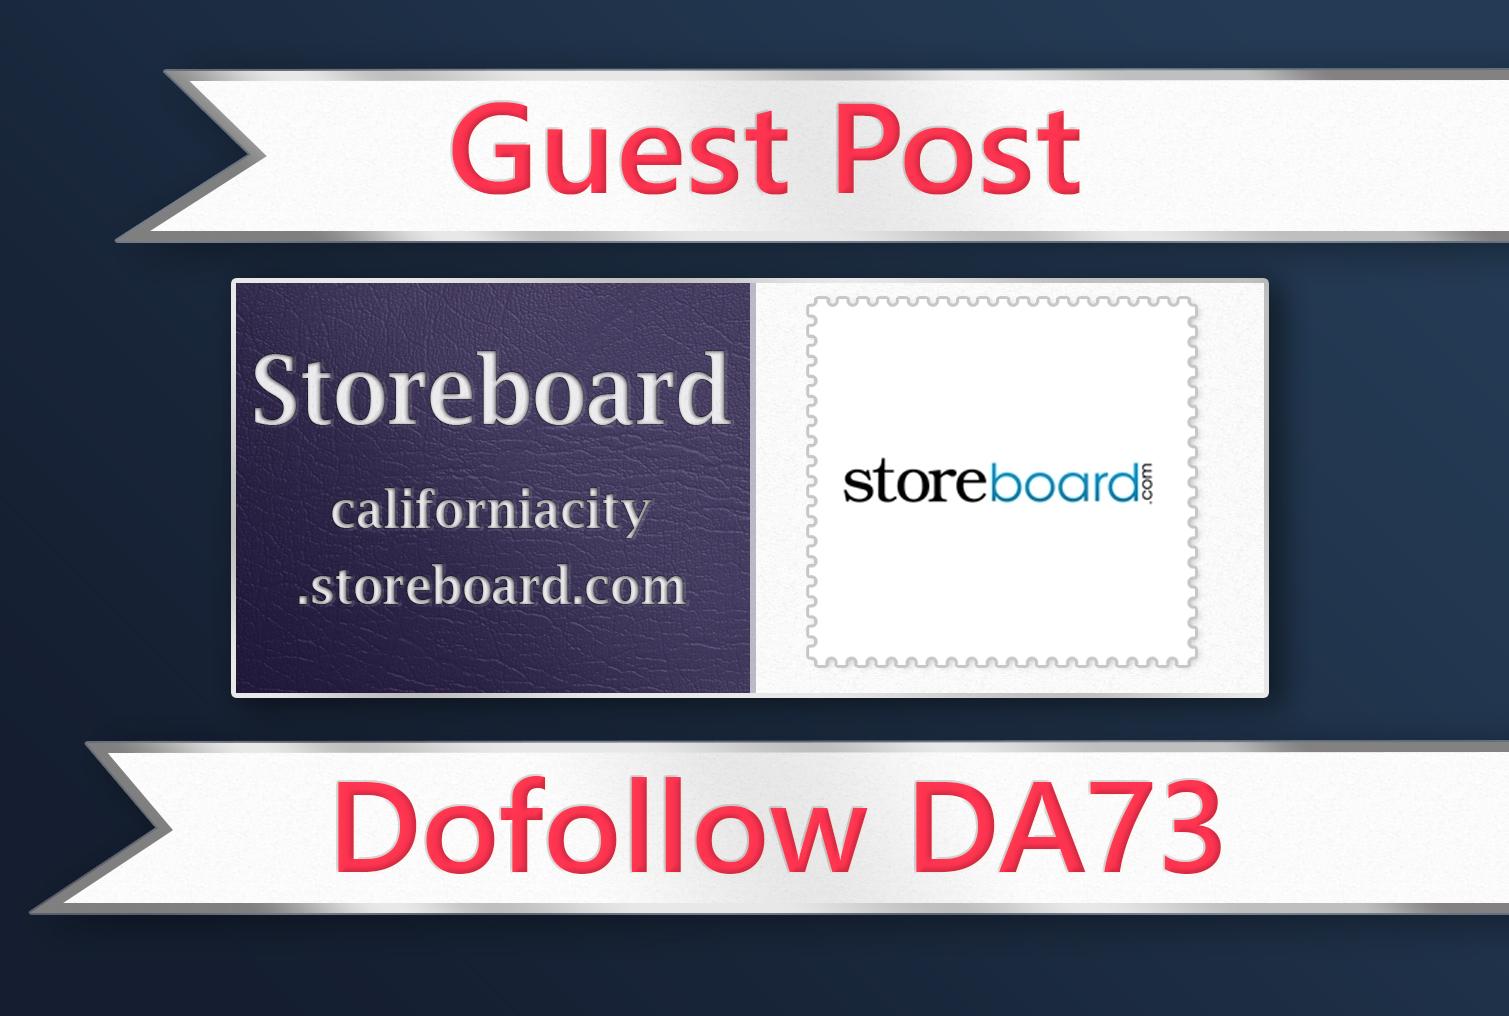 Guest post on Storeboard - DA73